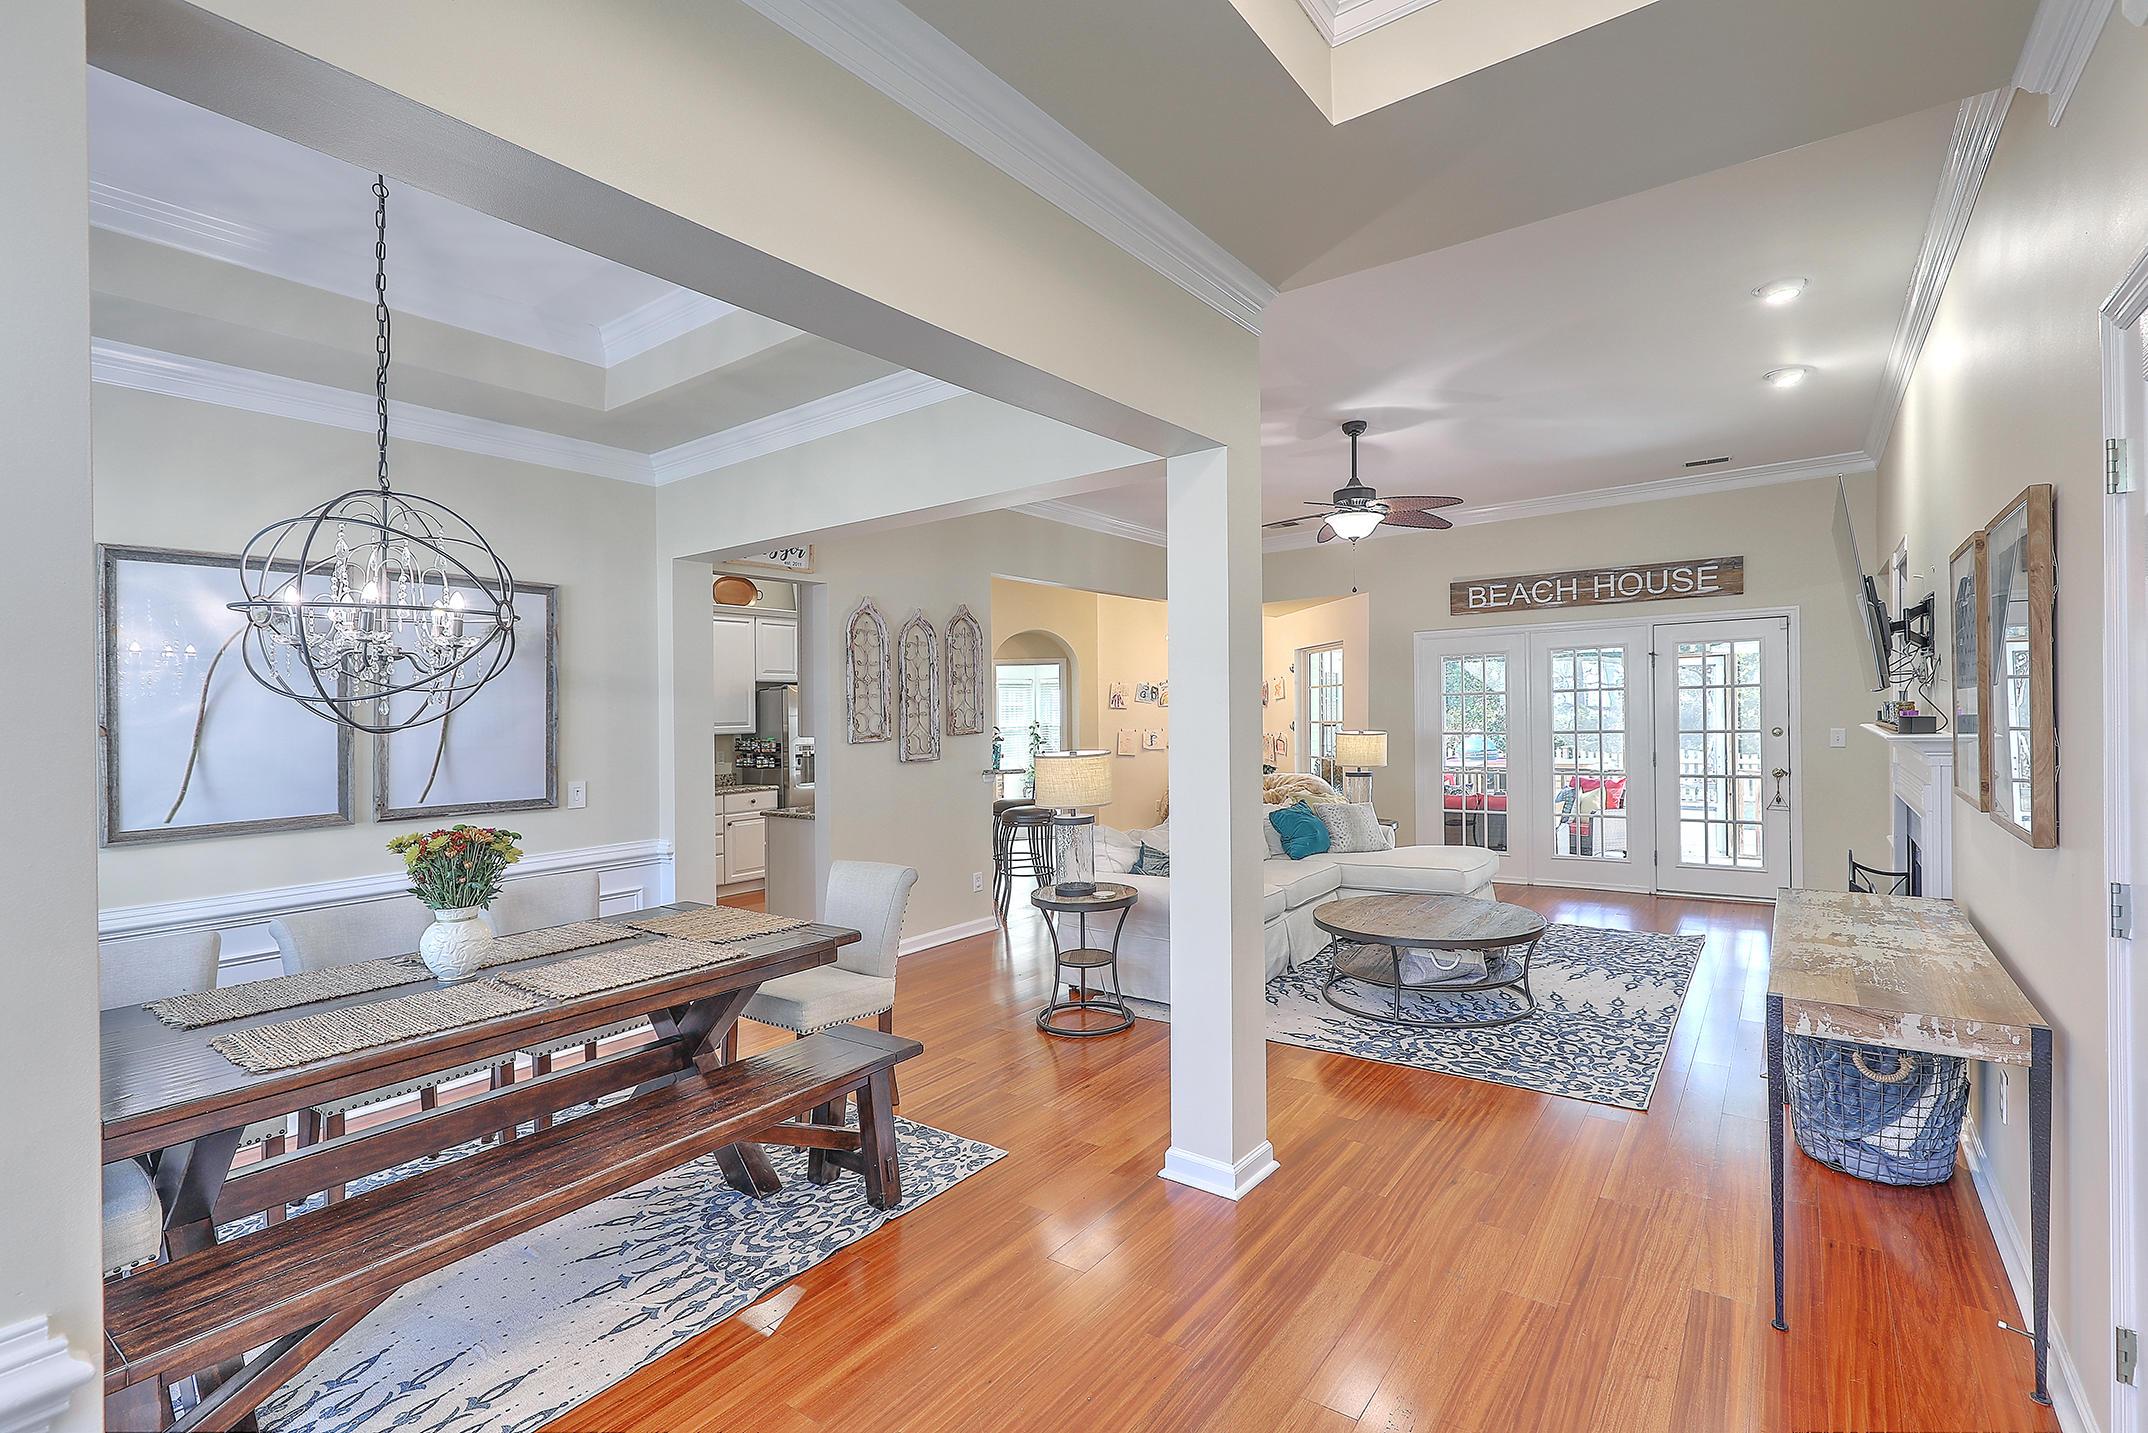 Dunes West Homes For Sale - 1471 Cypress Pointe, Mount Pleasant, SC - 32